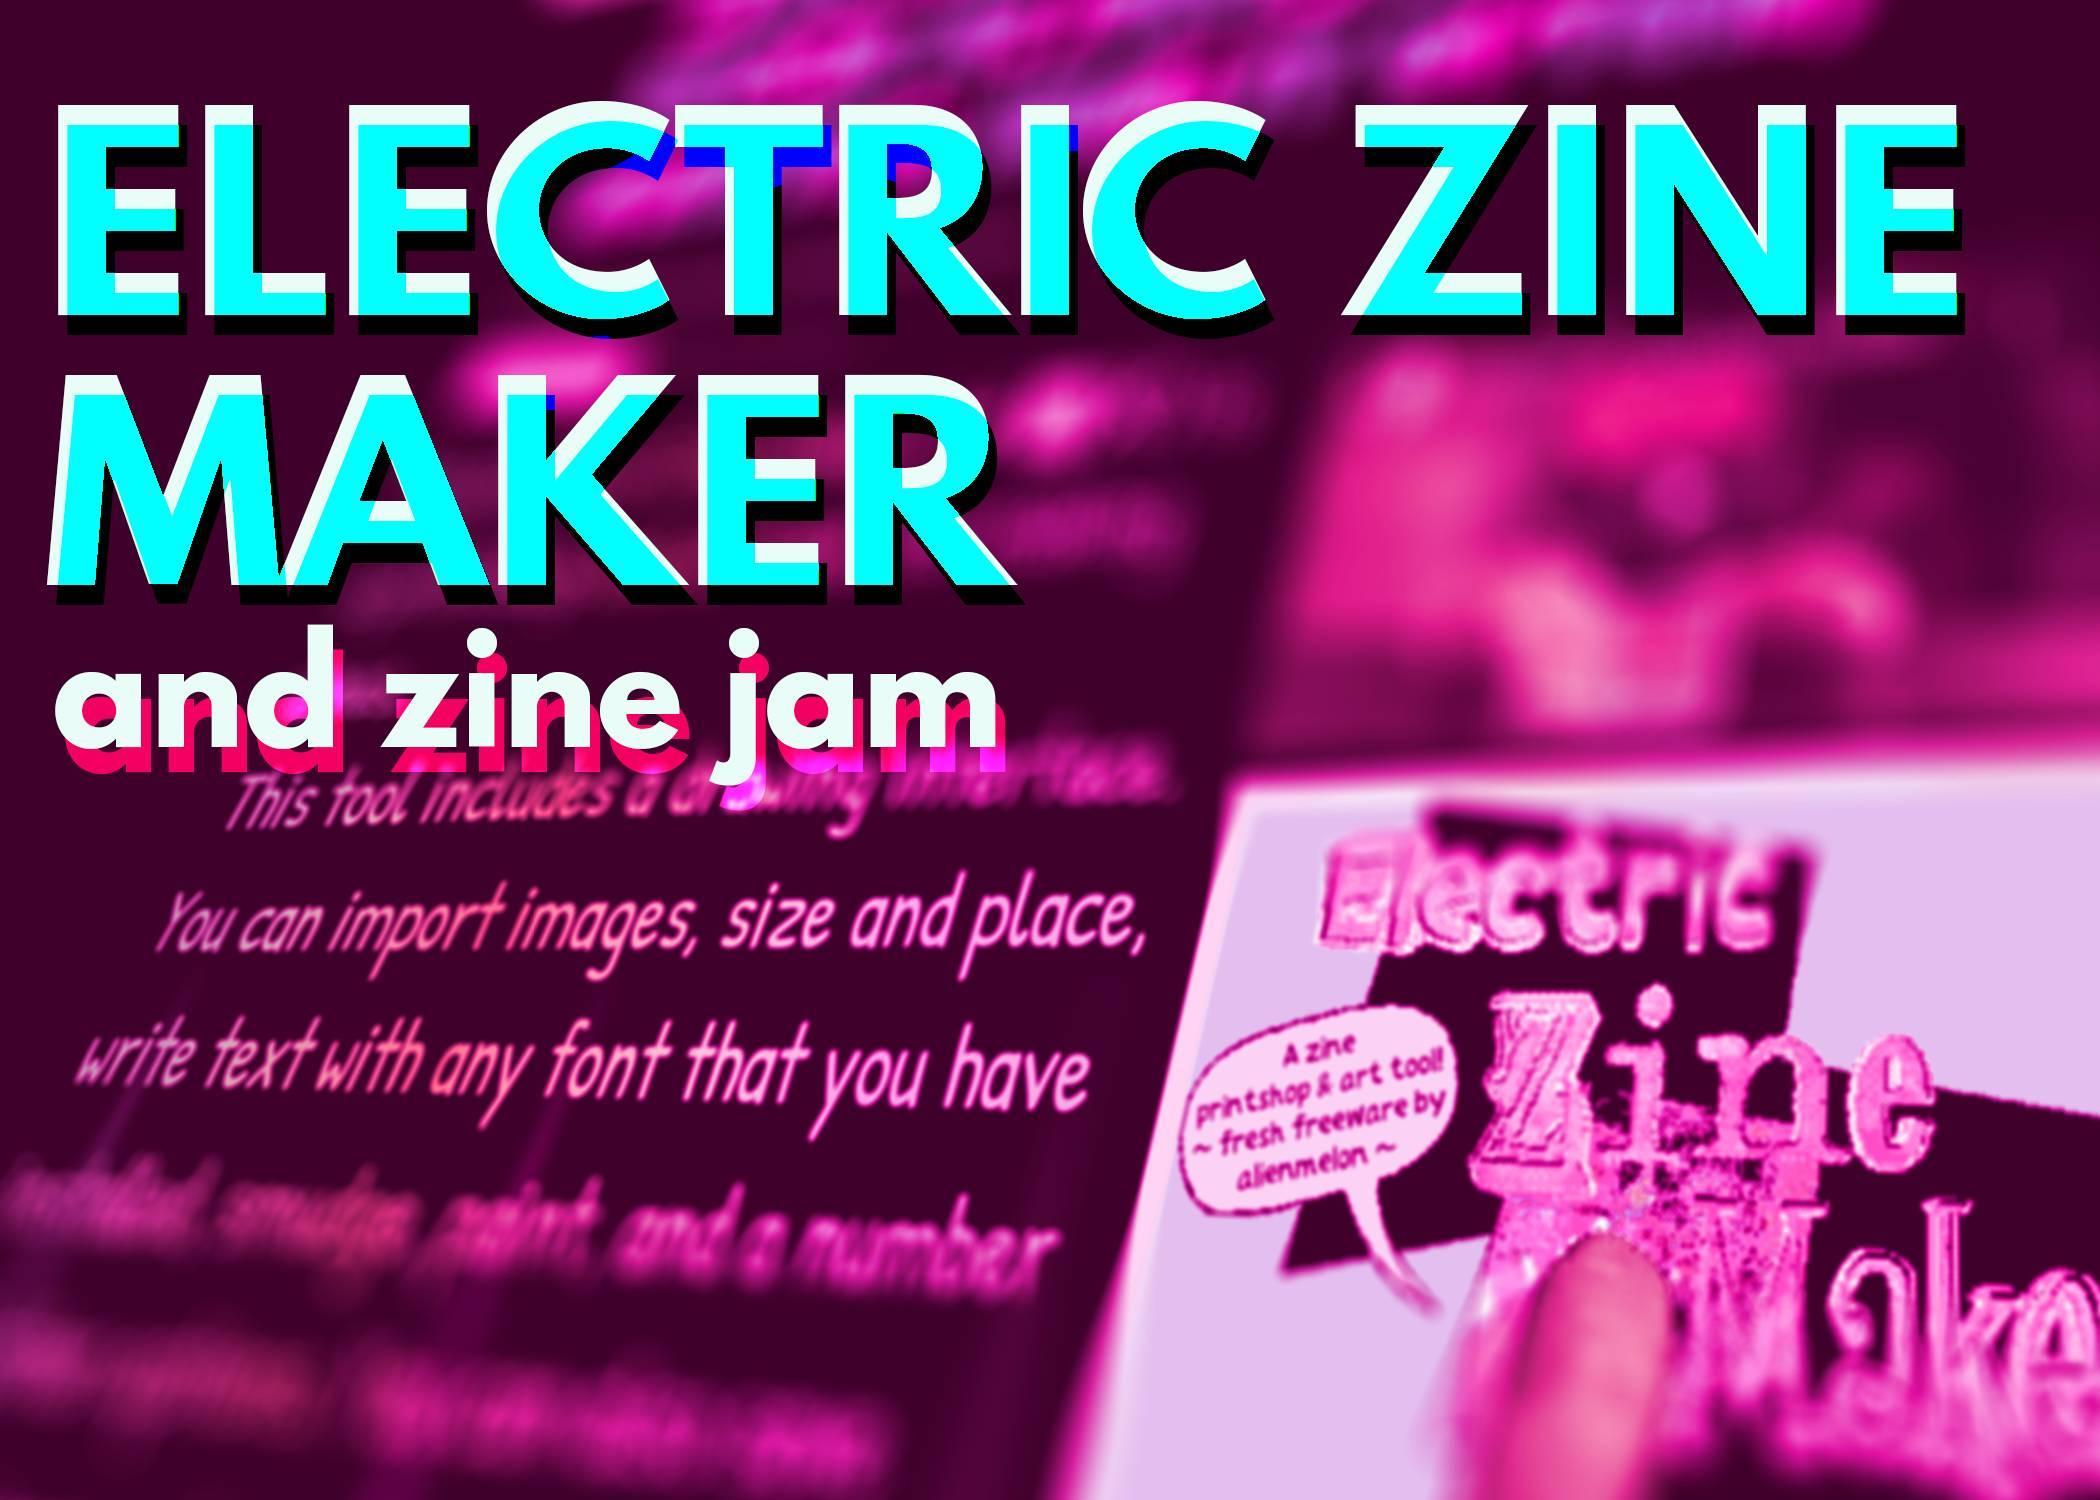 Electric Zine Maker and zine jam